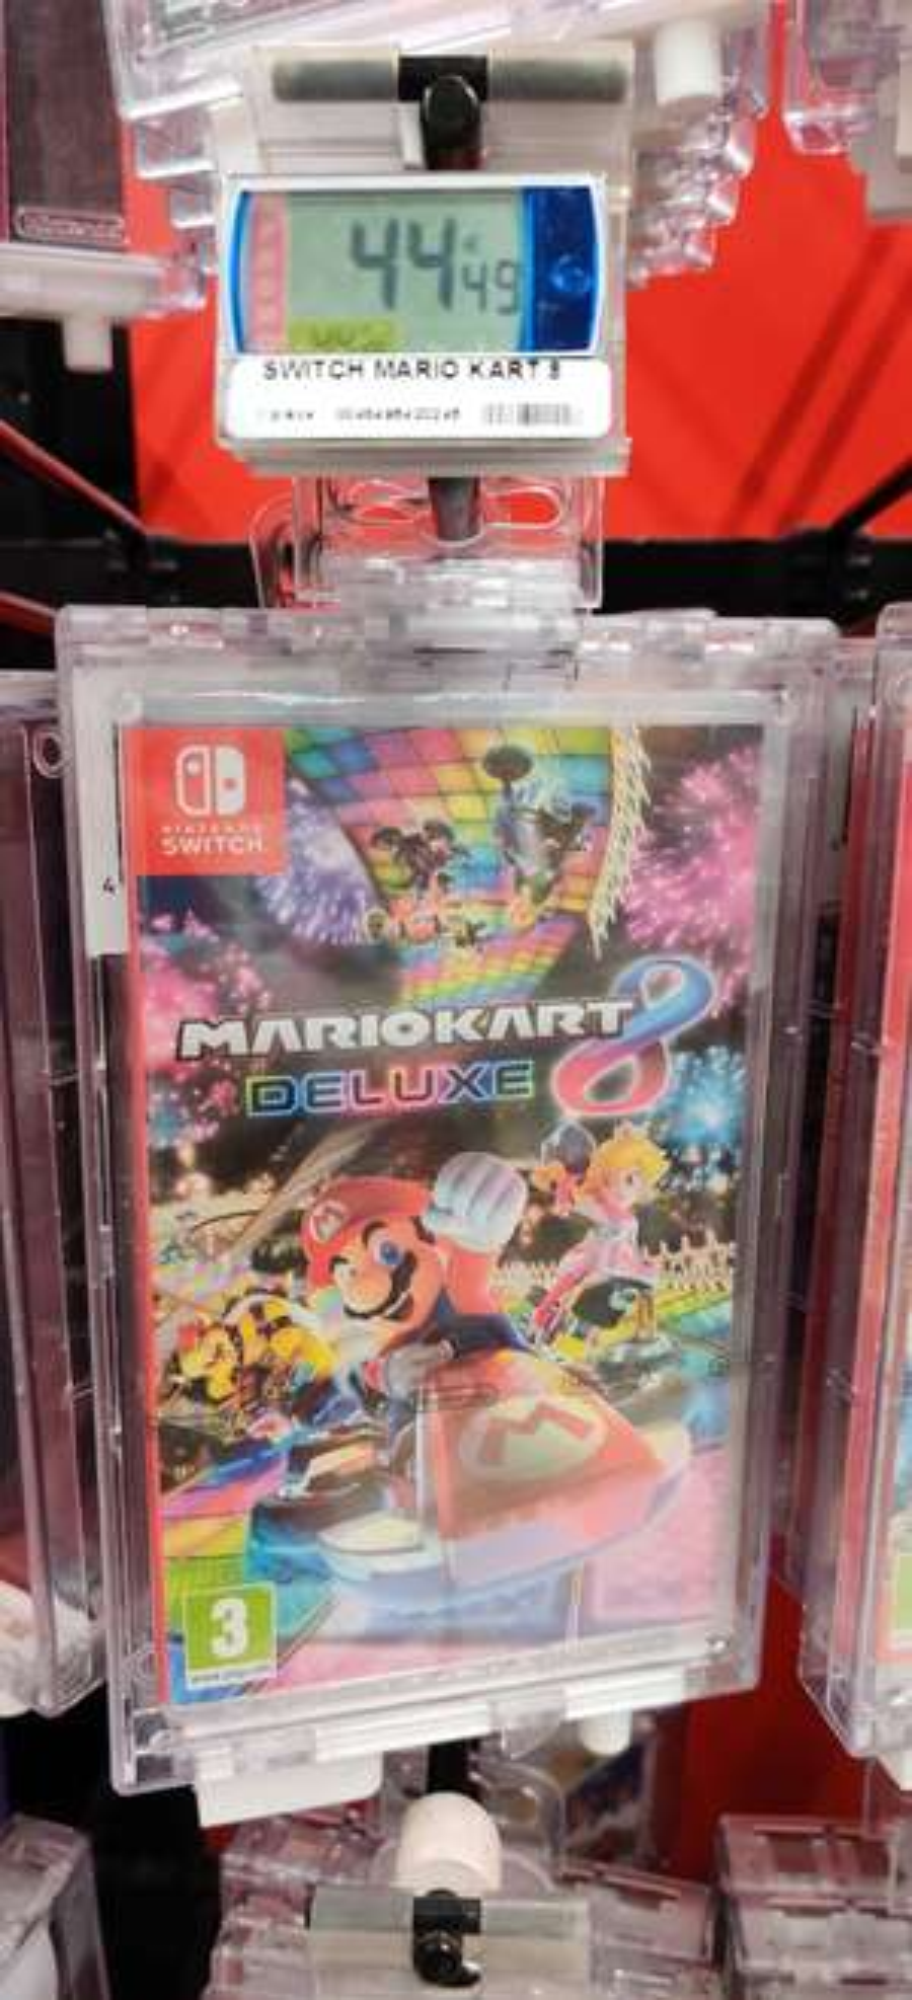 Jeu Mario Kart 8 Deluxe sur Nintendo Switch - Meylan (38)